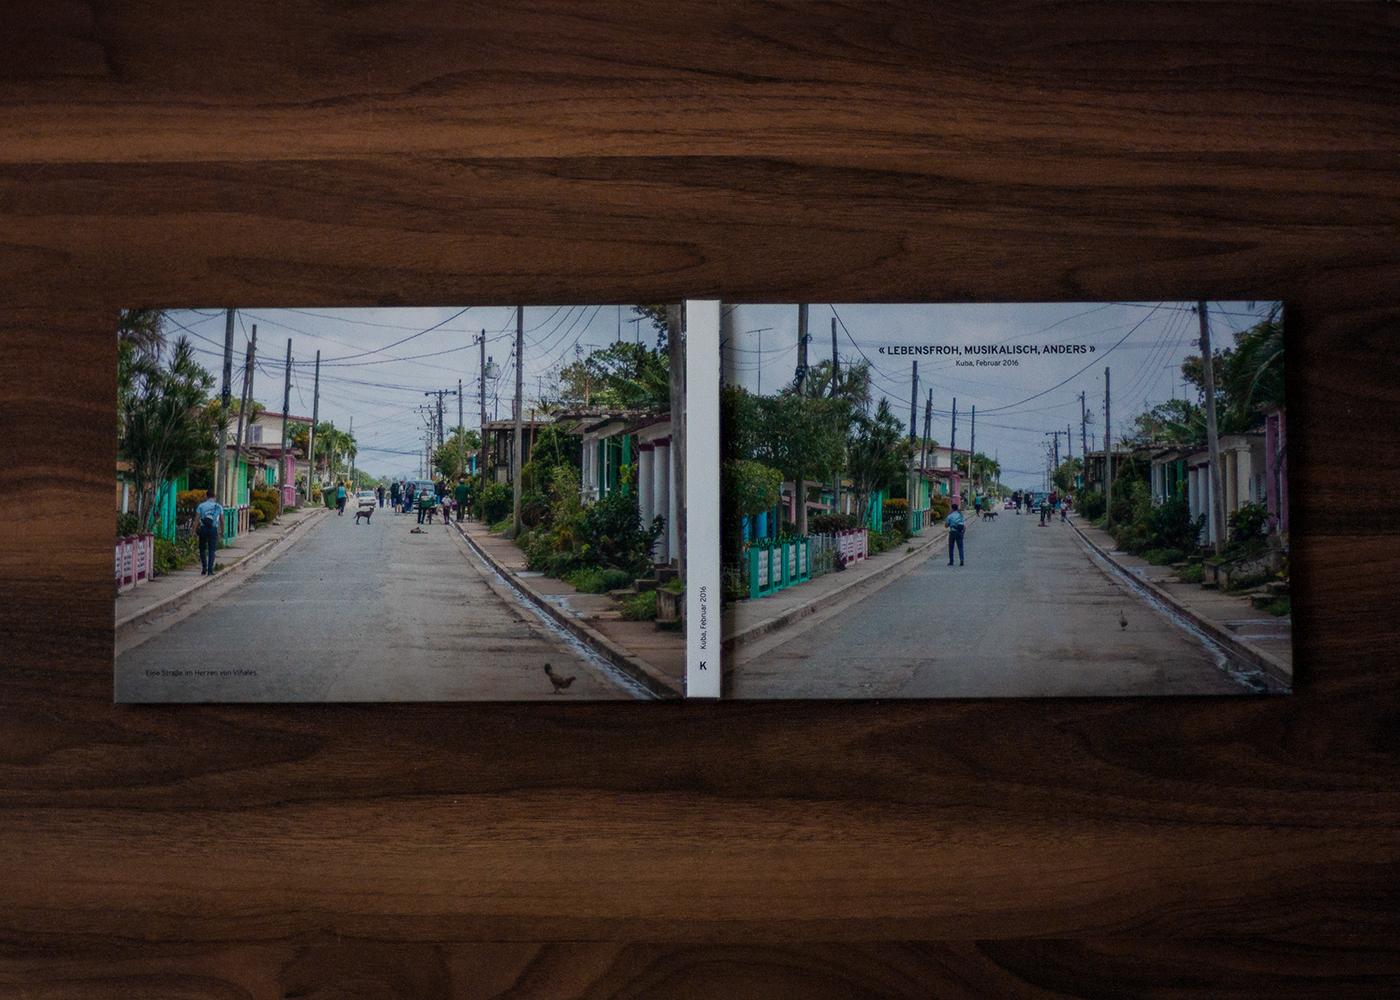 cuba kuba fotobuch Landscape book buch Travel Reise Photography  fotografie